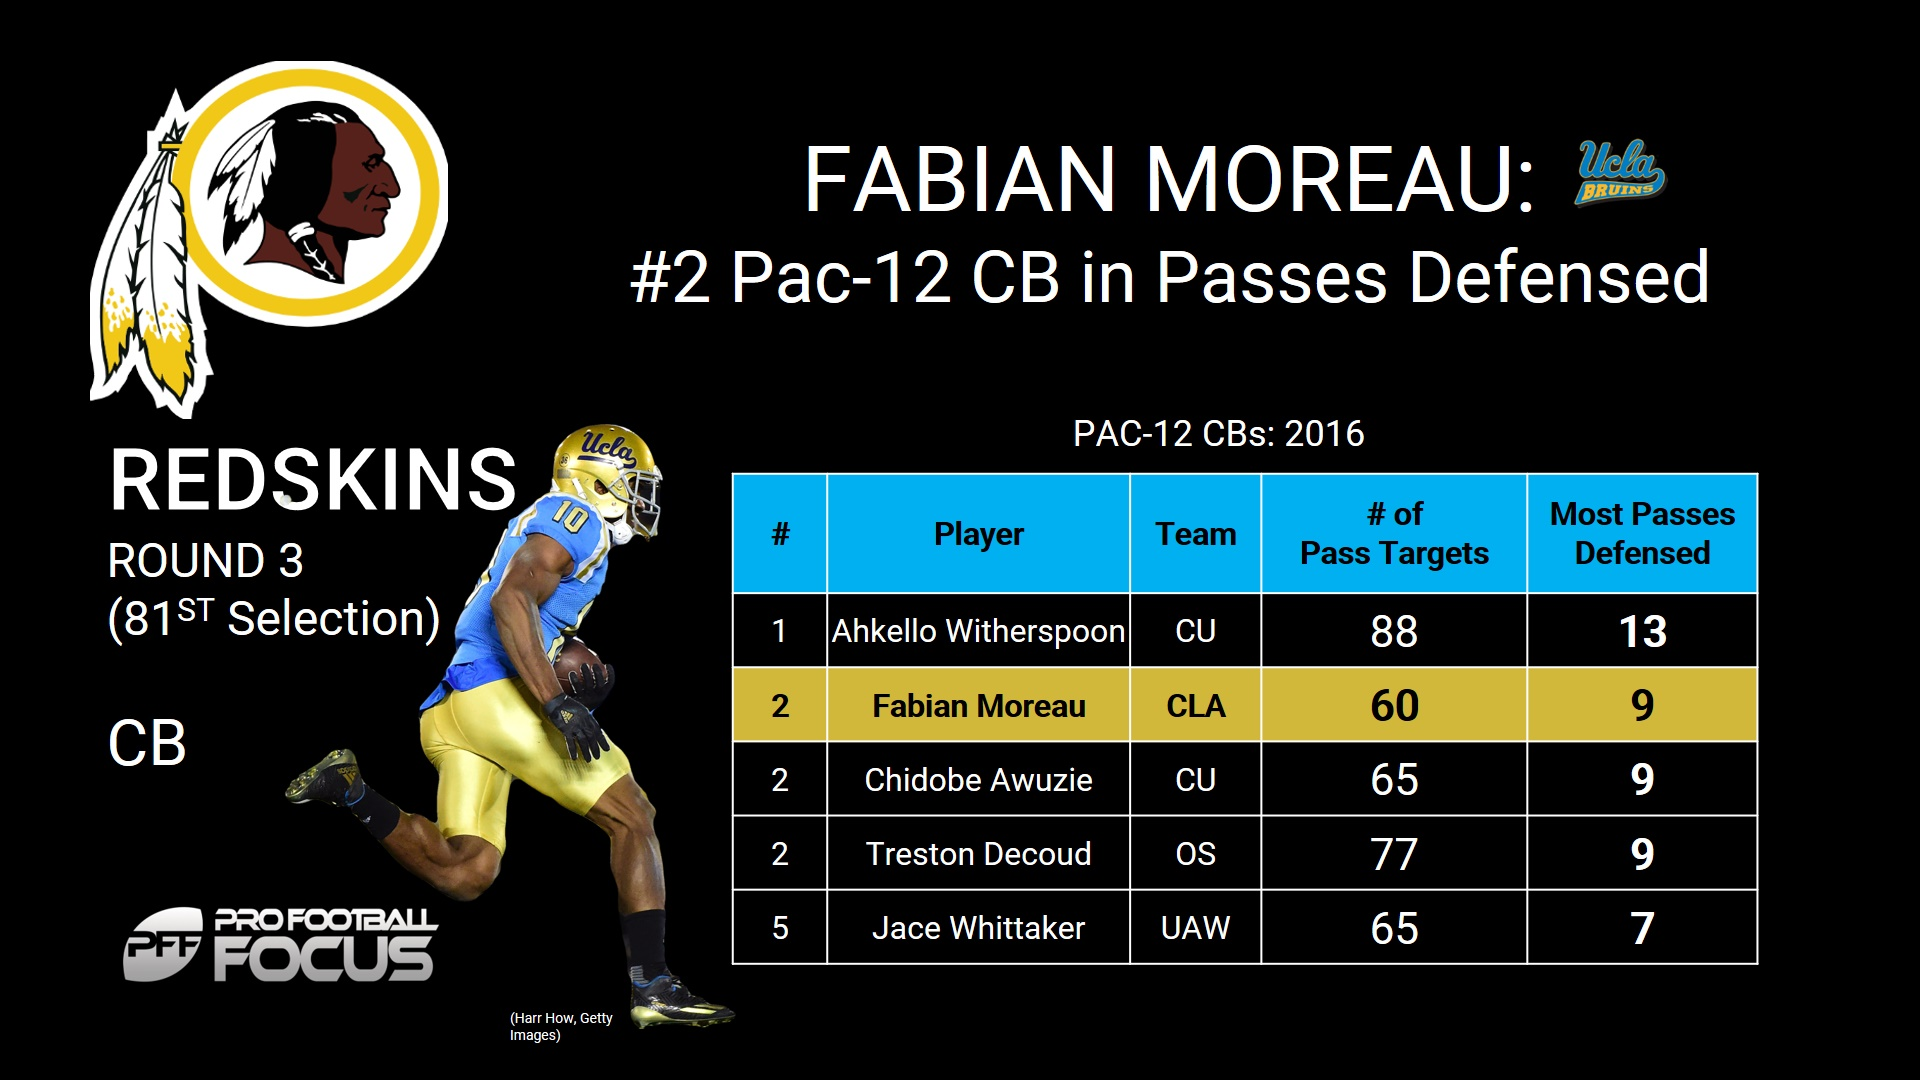 Fabian Moreau